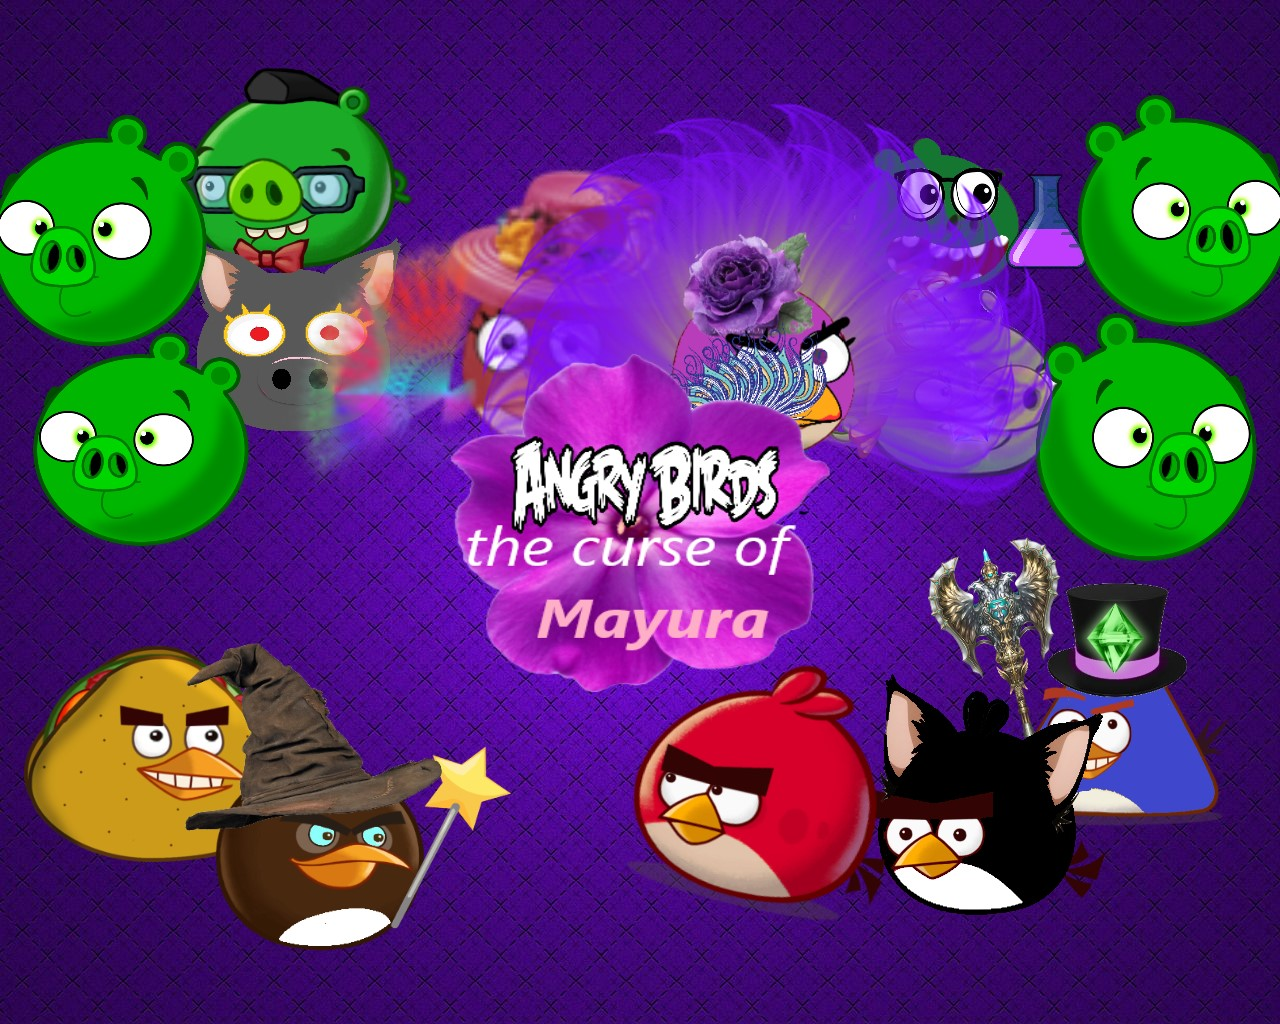 Angry Birds: The Curse of Mayura